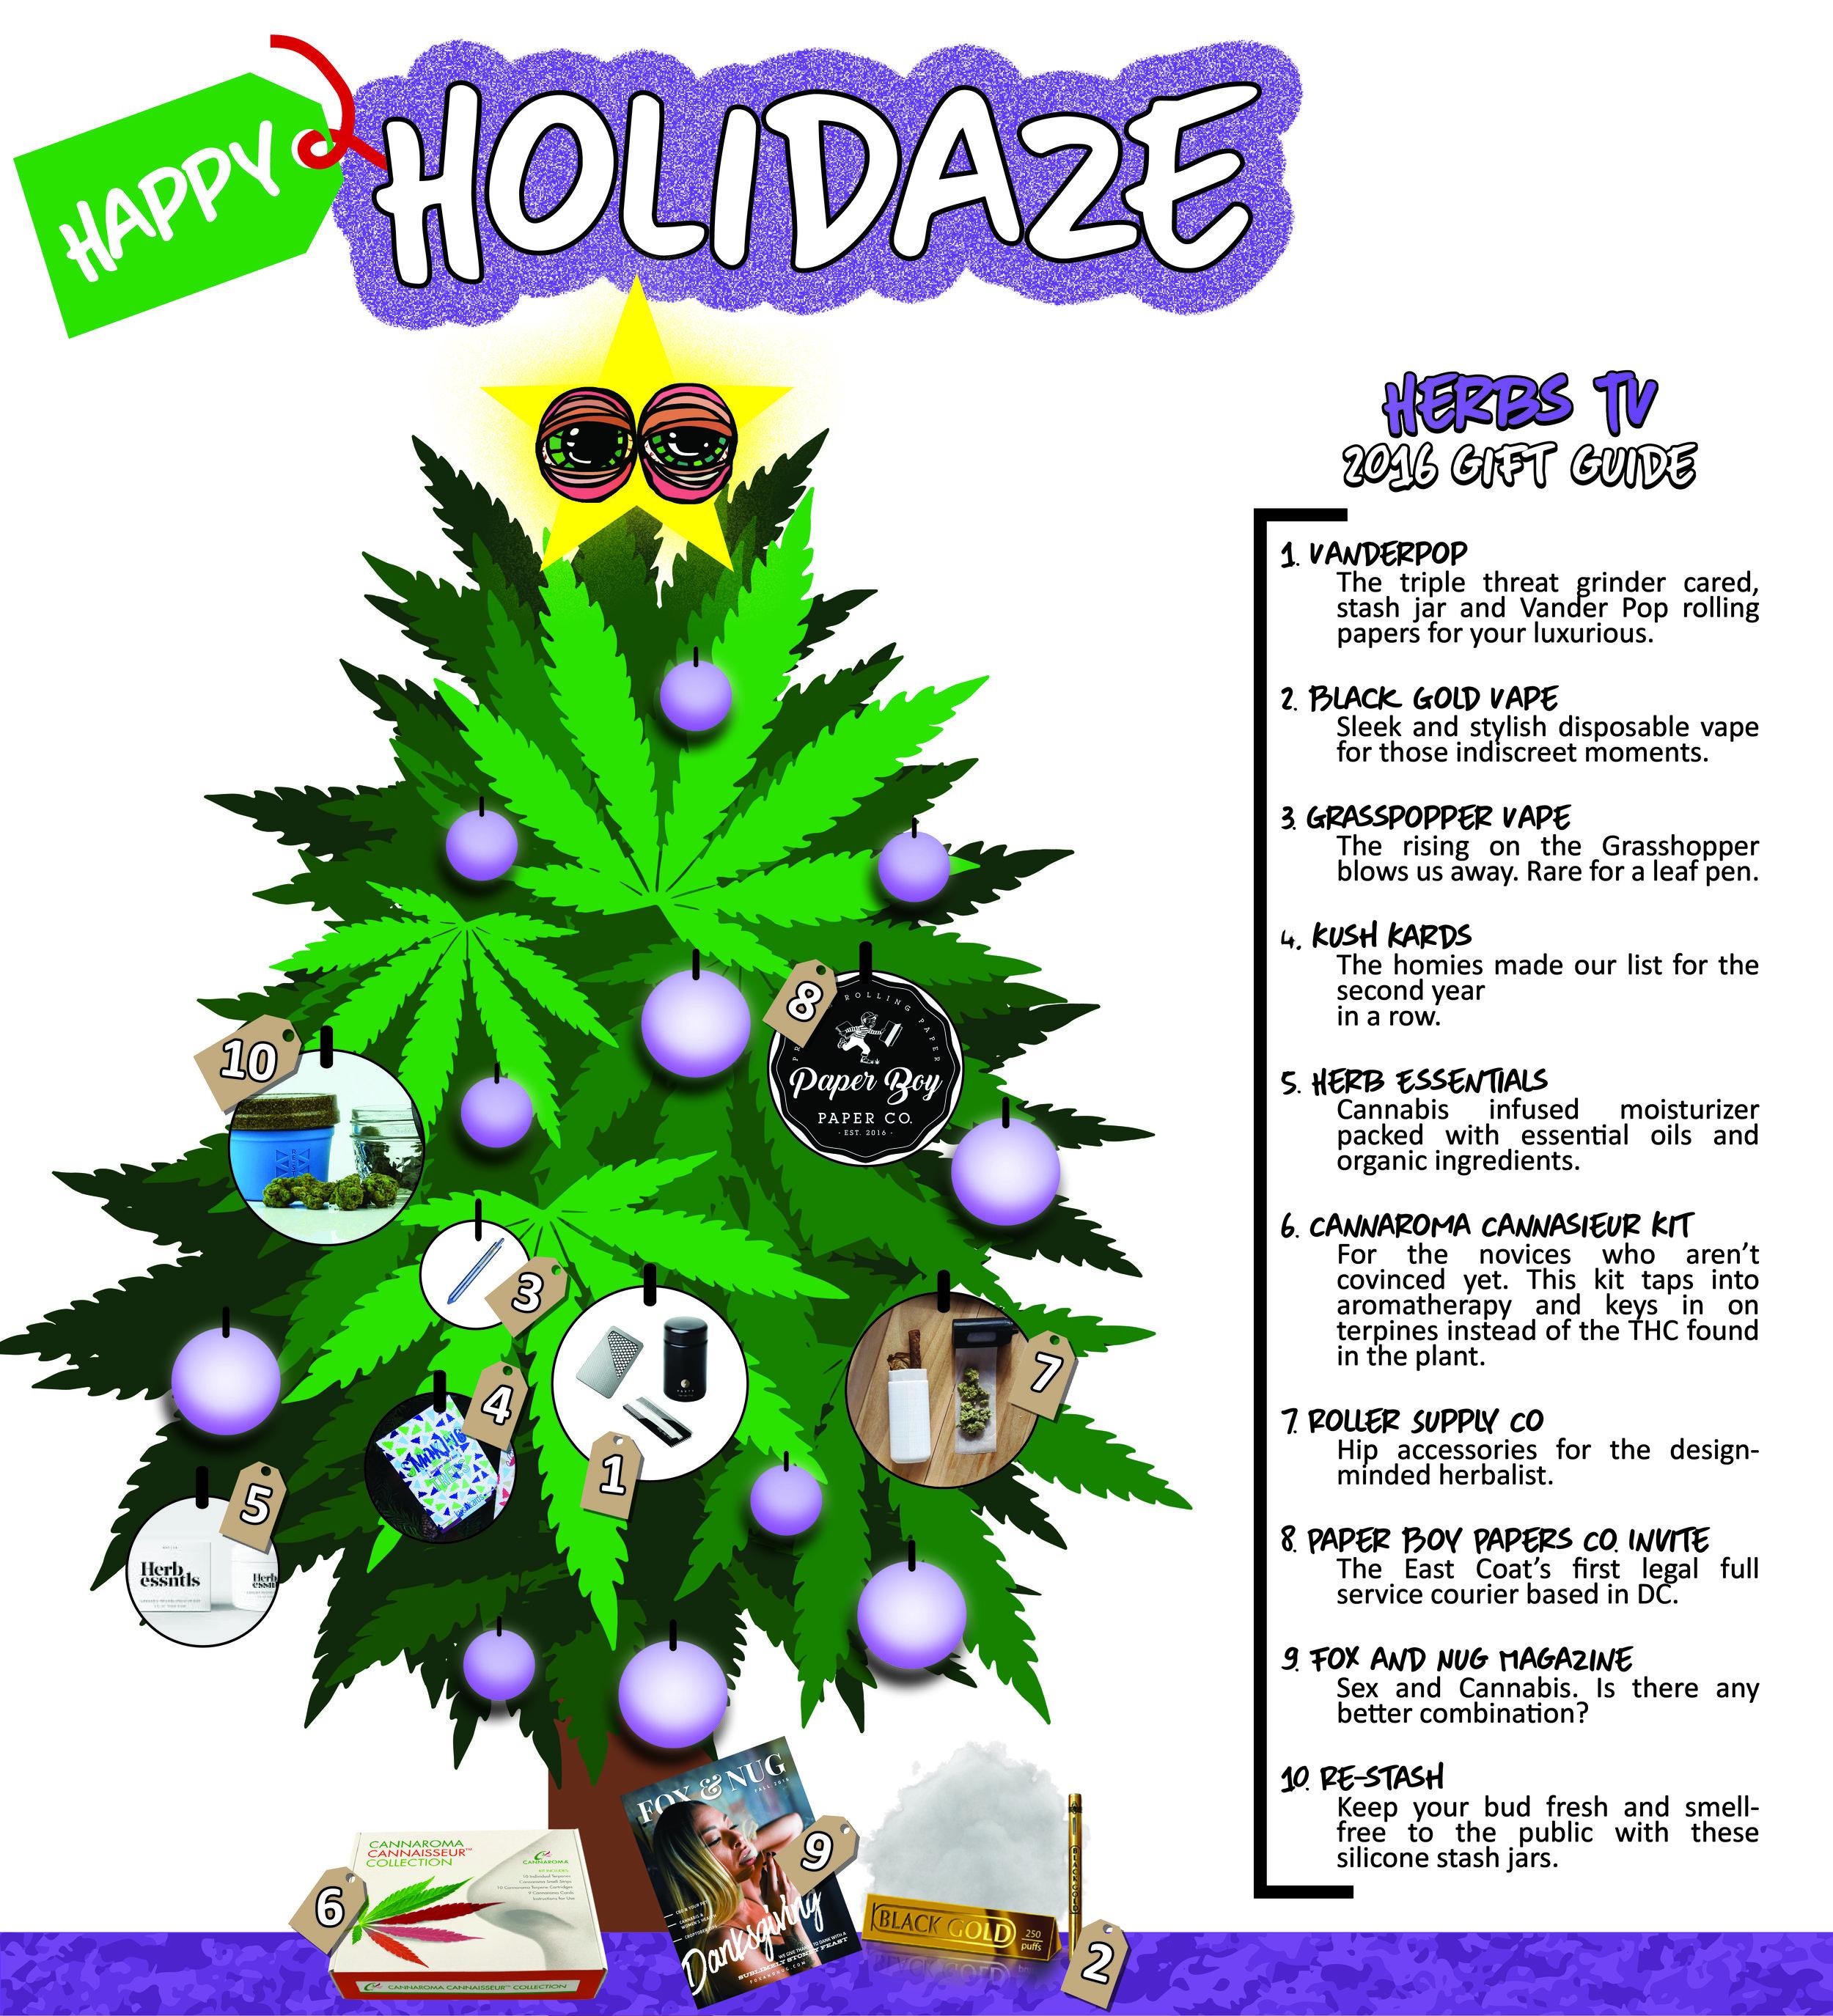 HappyHolidaze_7.jpg